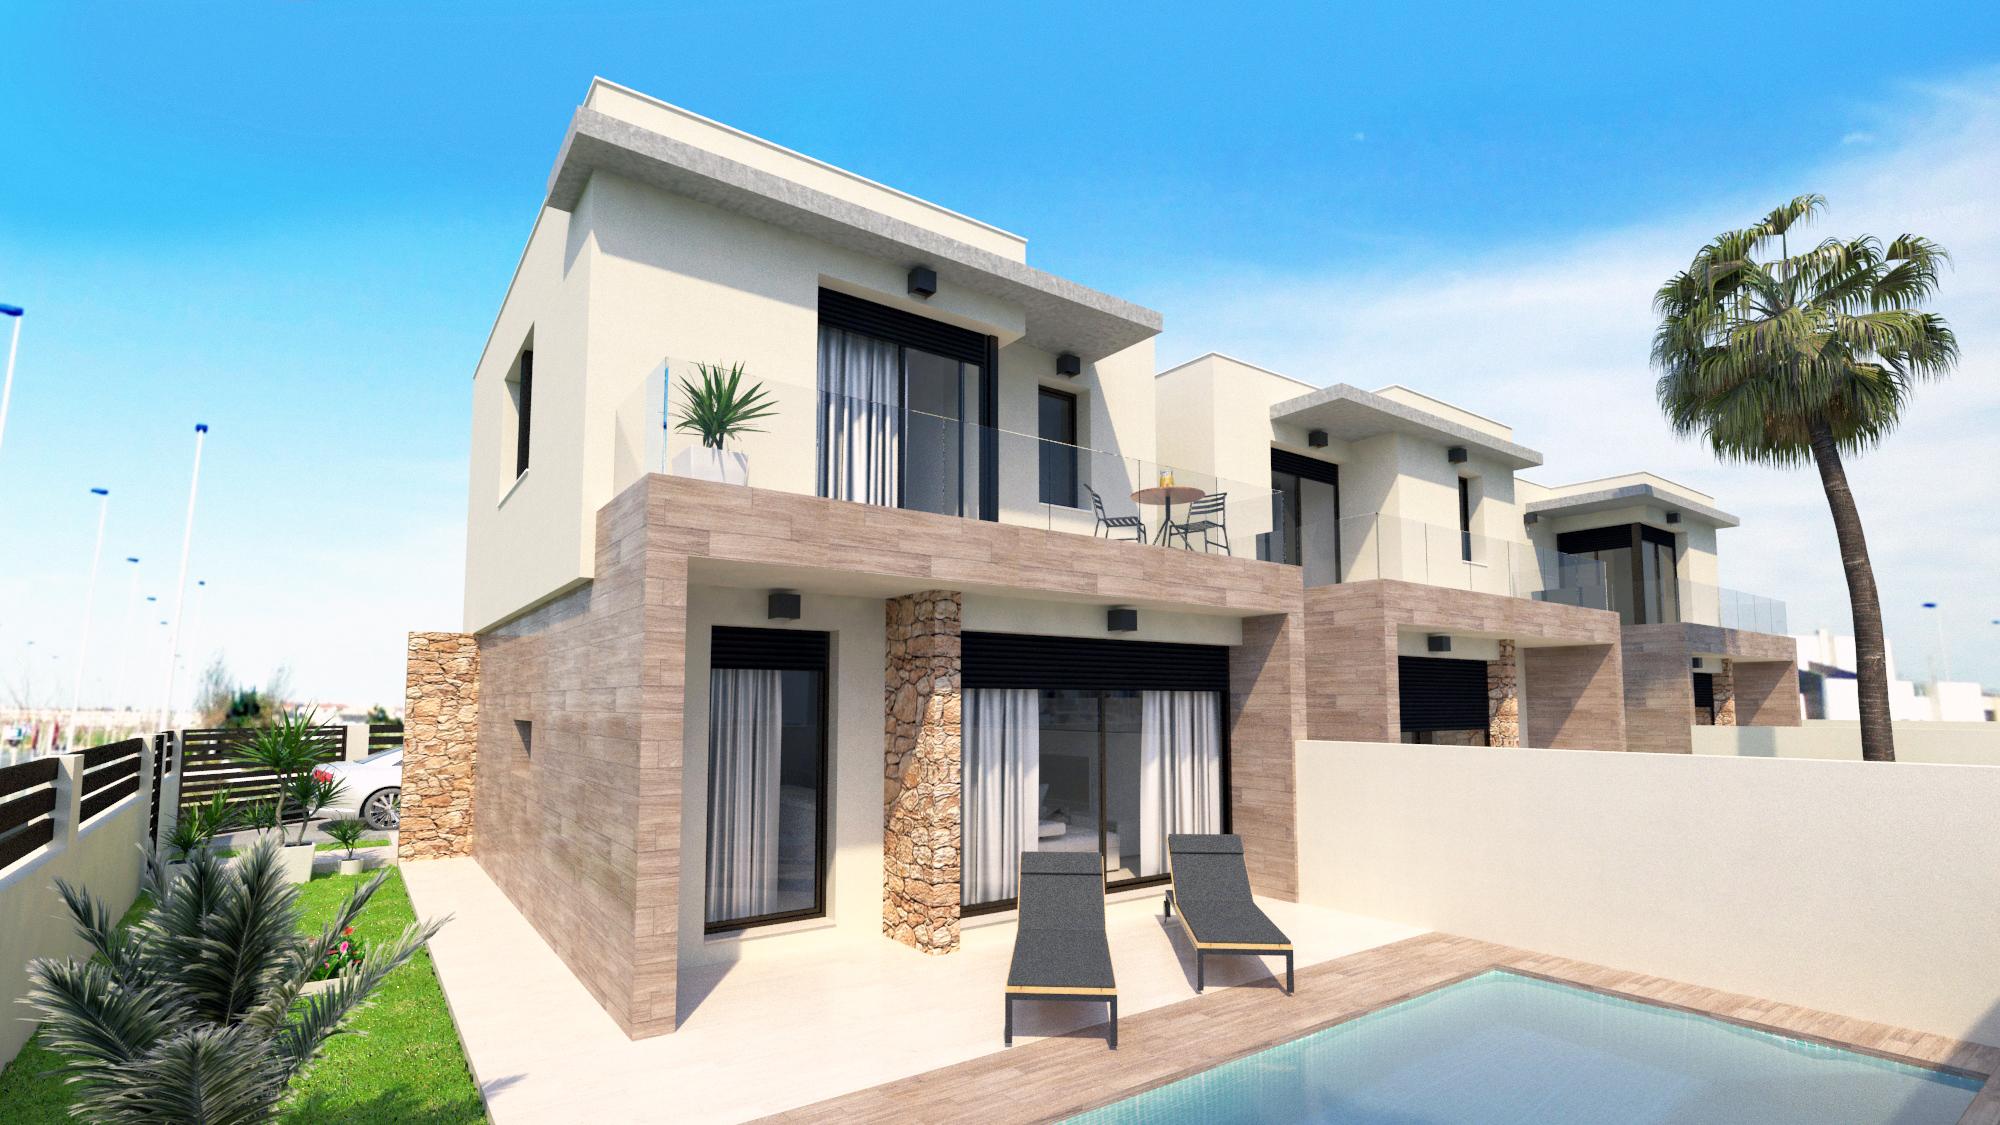 Three bedroom, three bathroom high quality new build property for sale in Torre de la Horadada